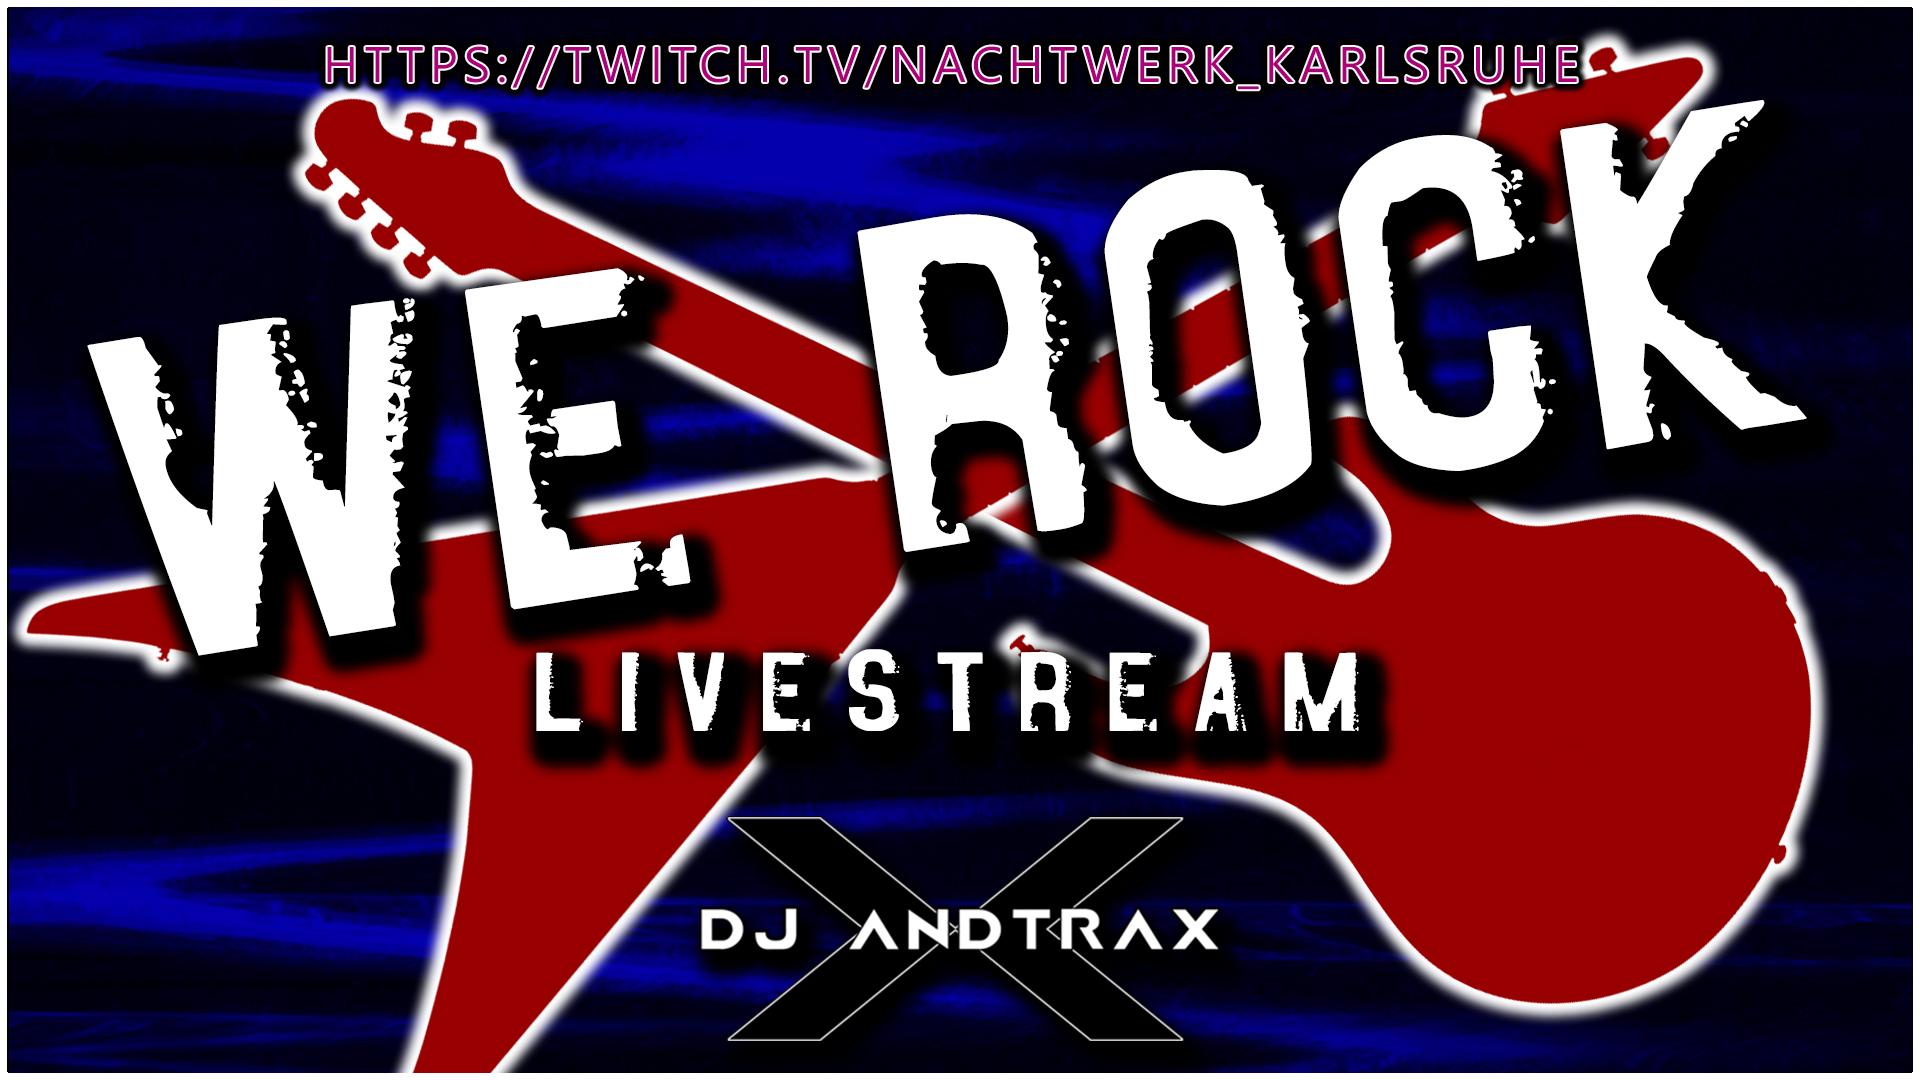 We Rock - Live Stream Edition